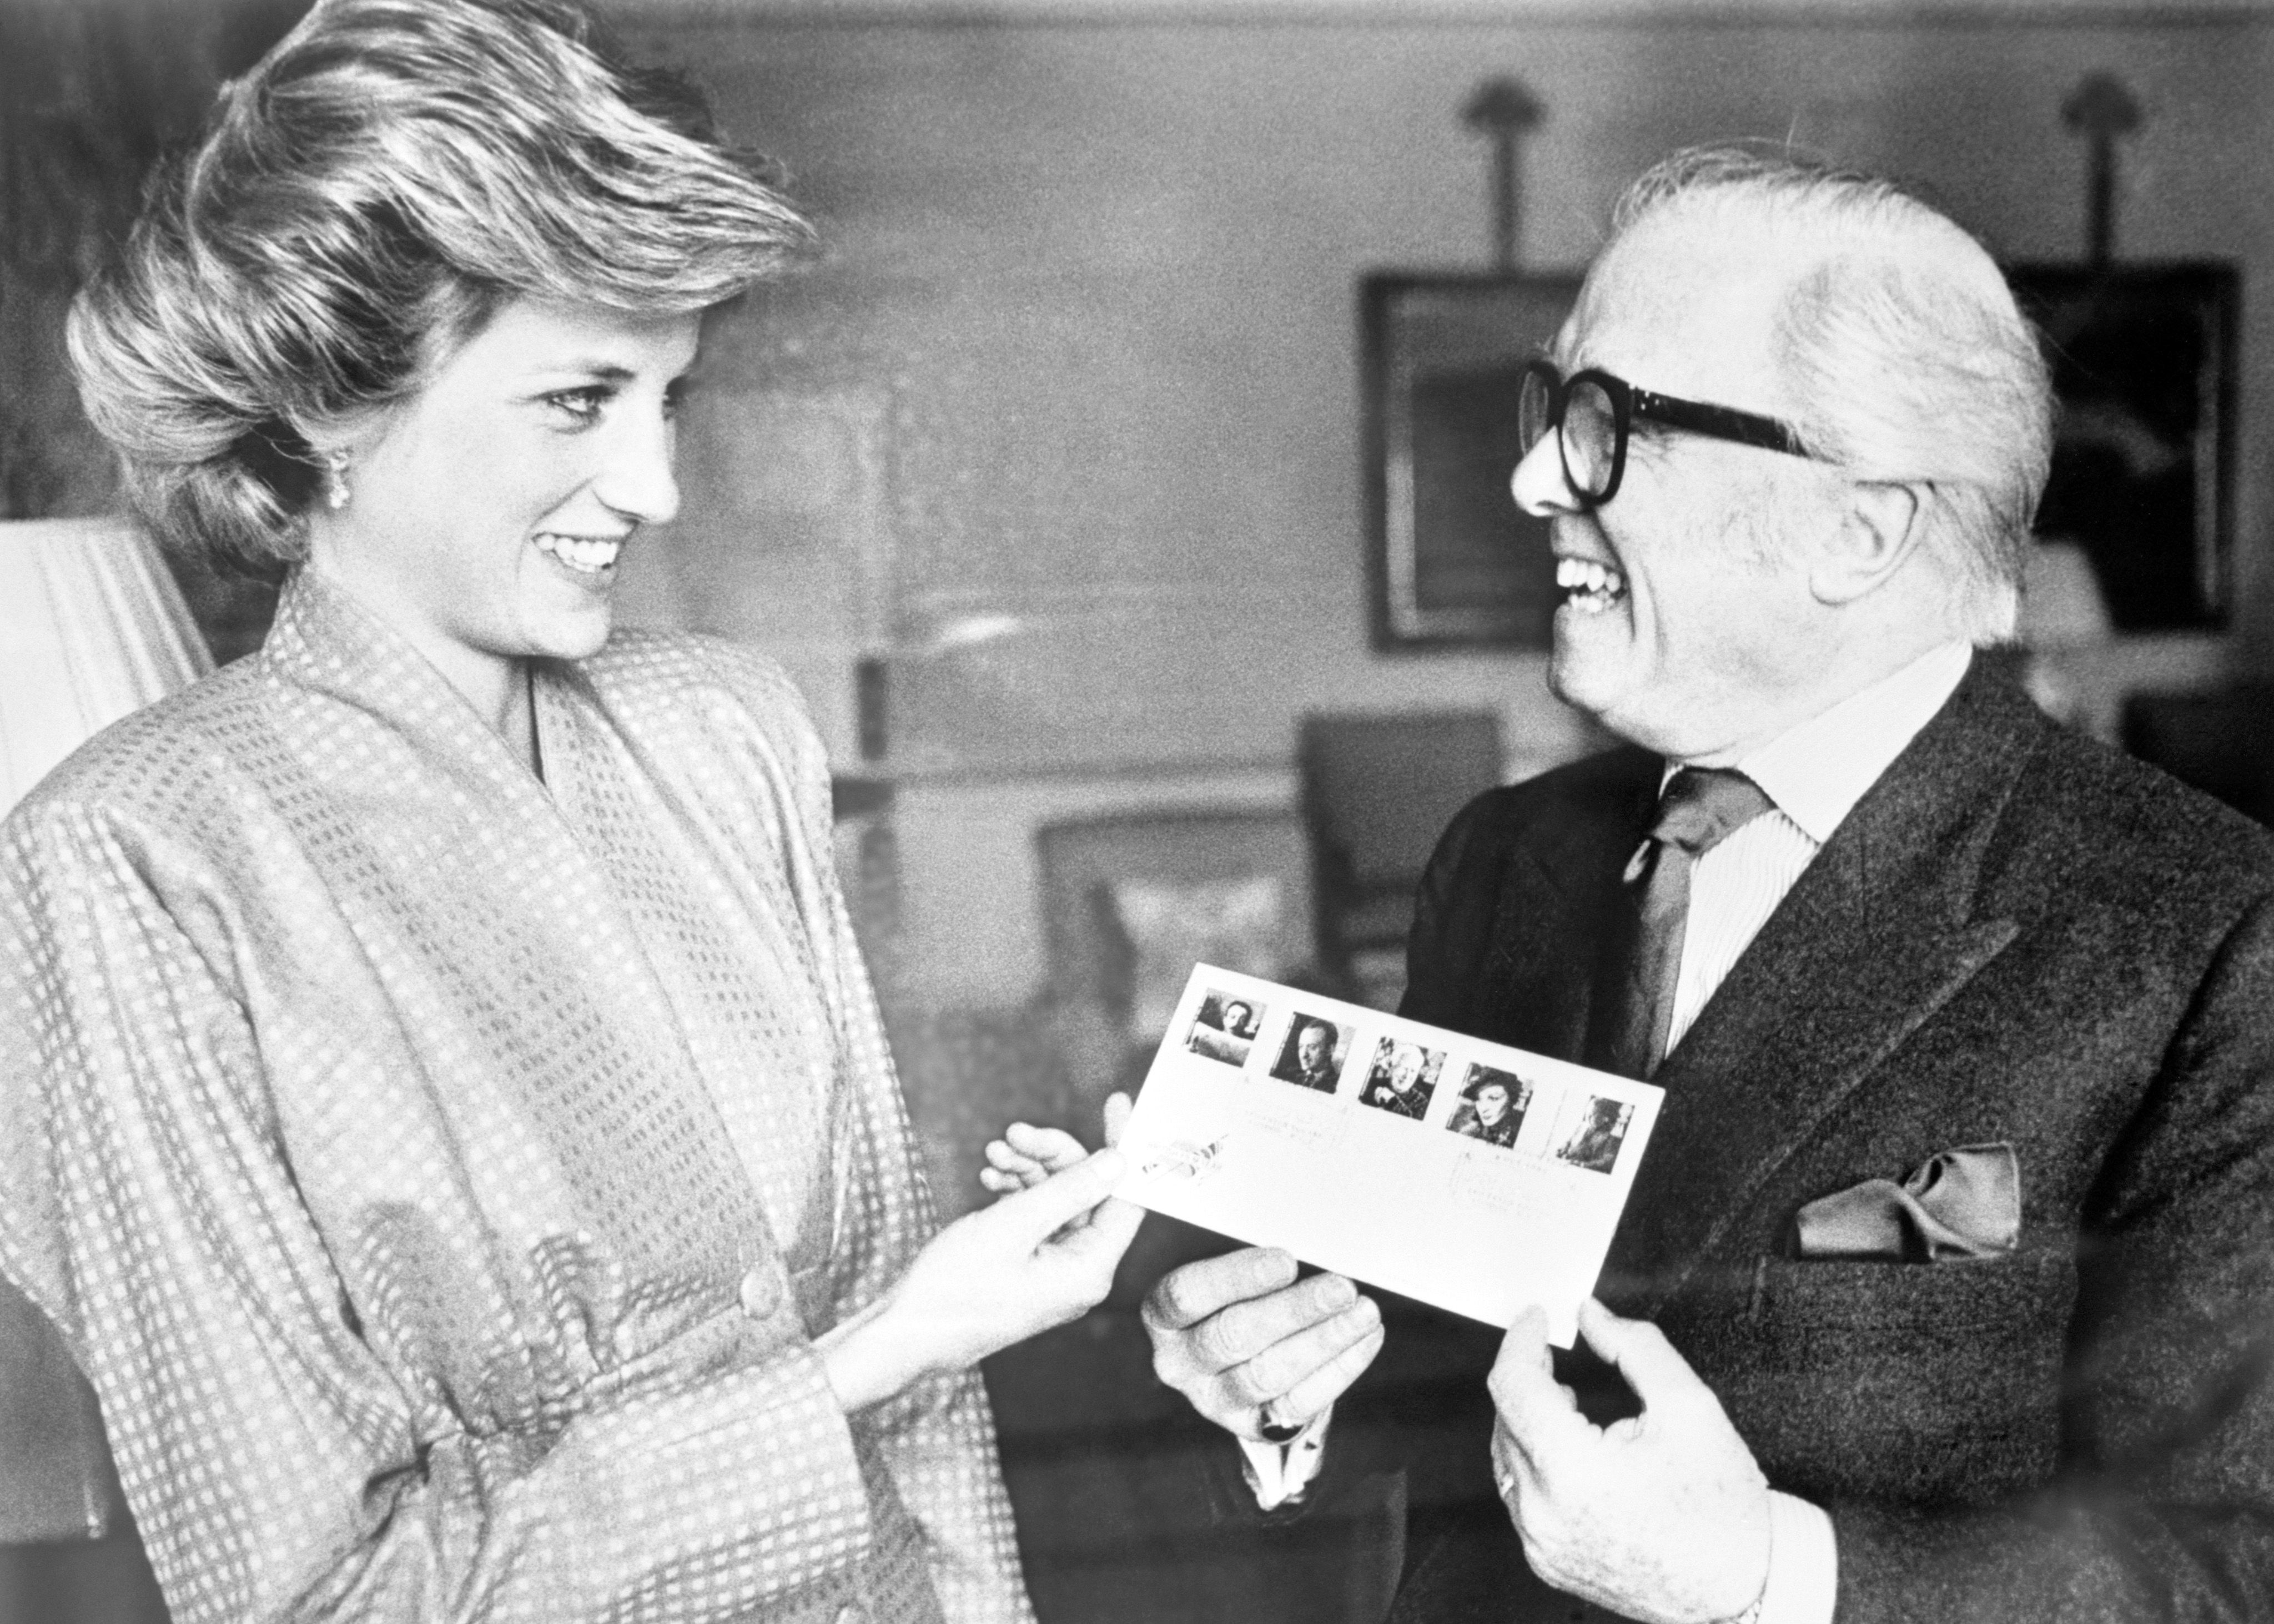 Sir Richard Attenborough és Diana hercegnő